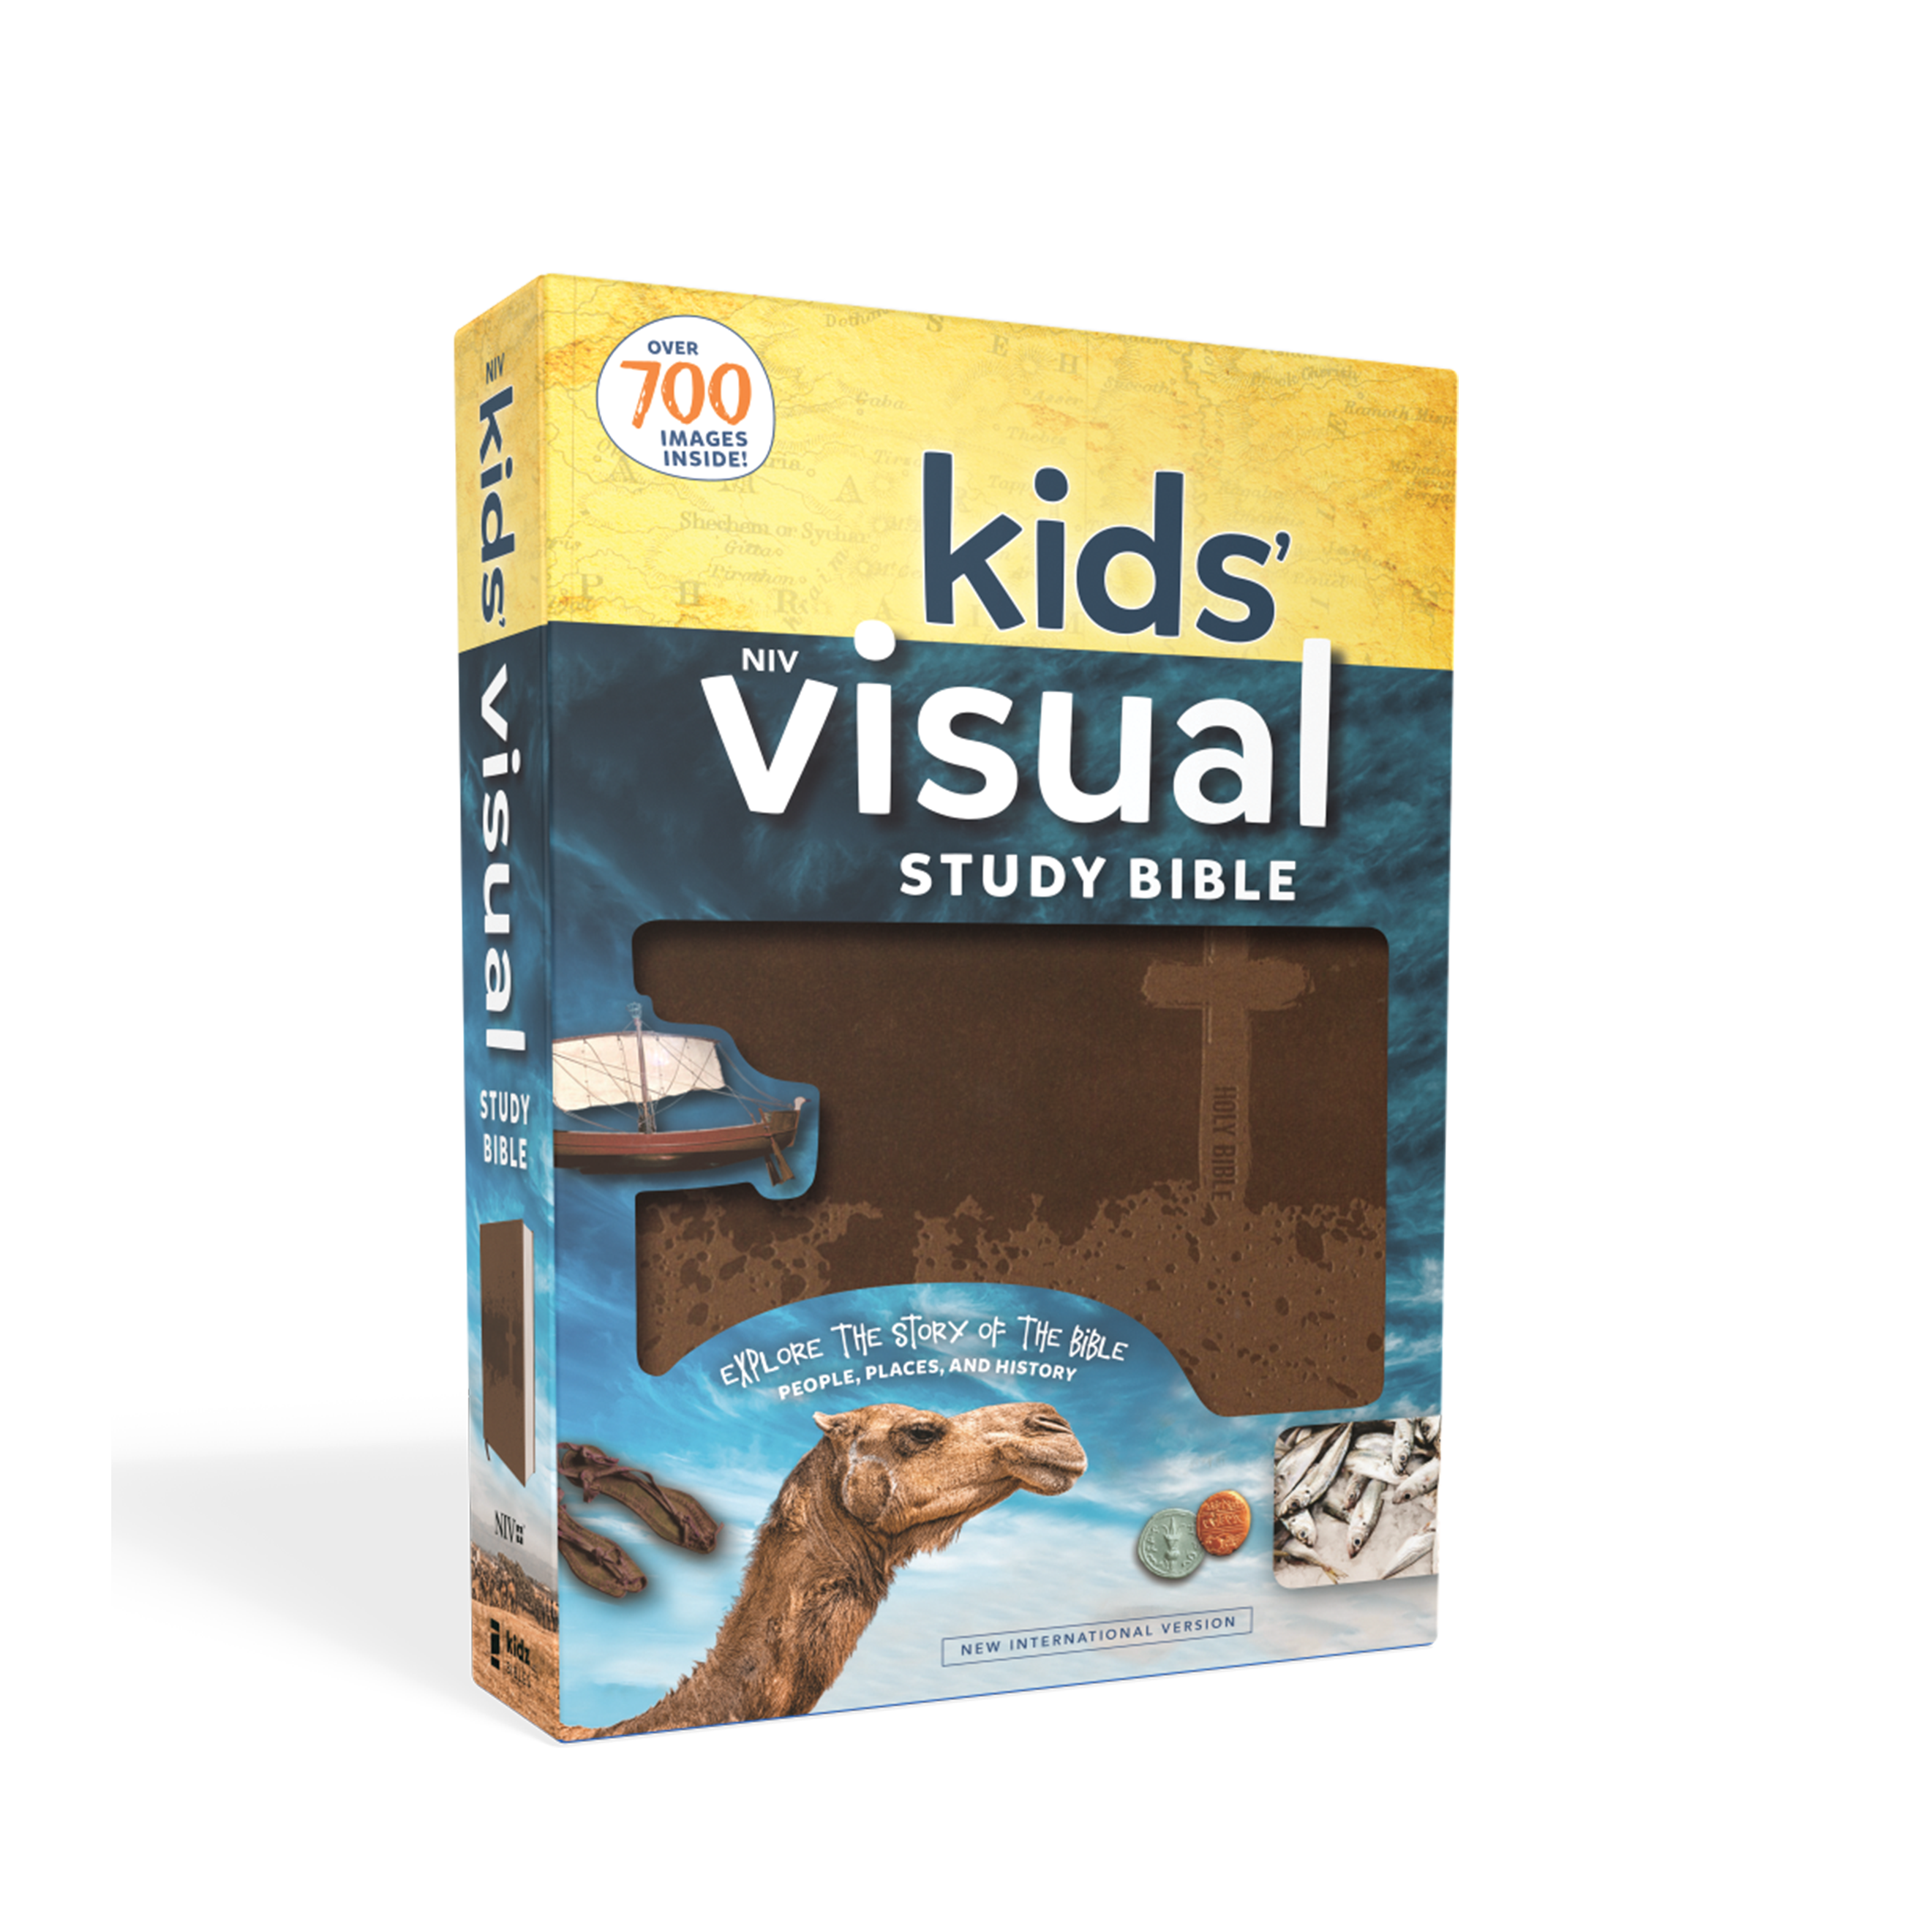 KidsVisual_BrownLS_9780310758464